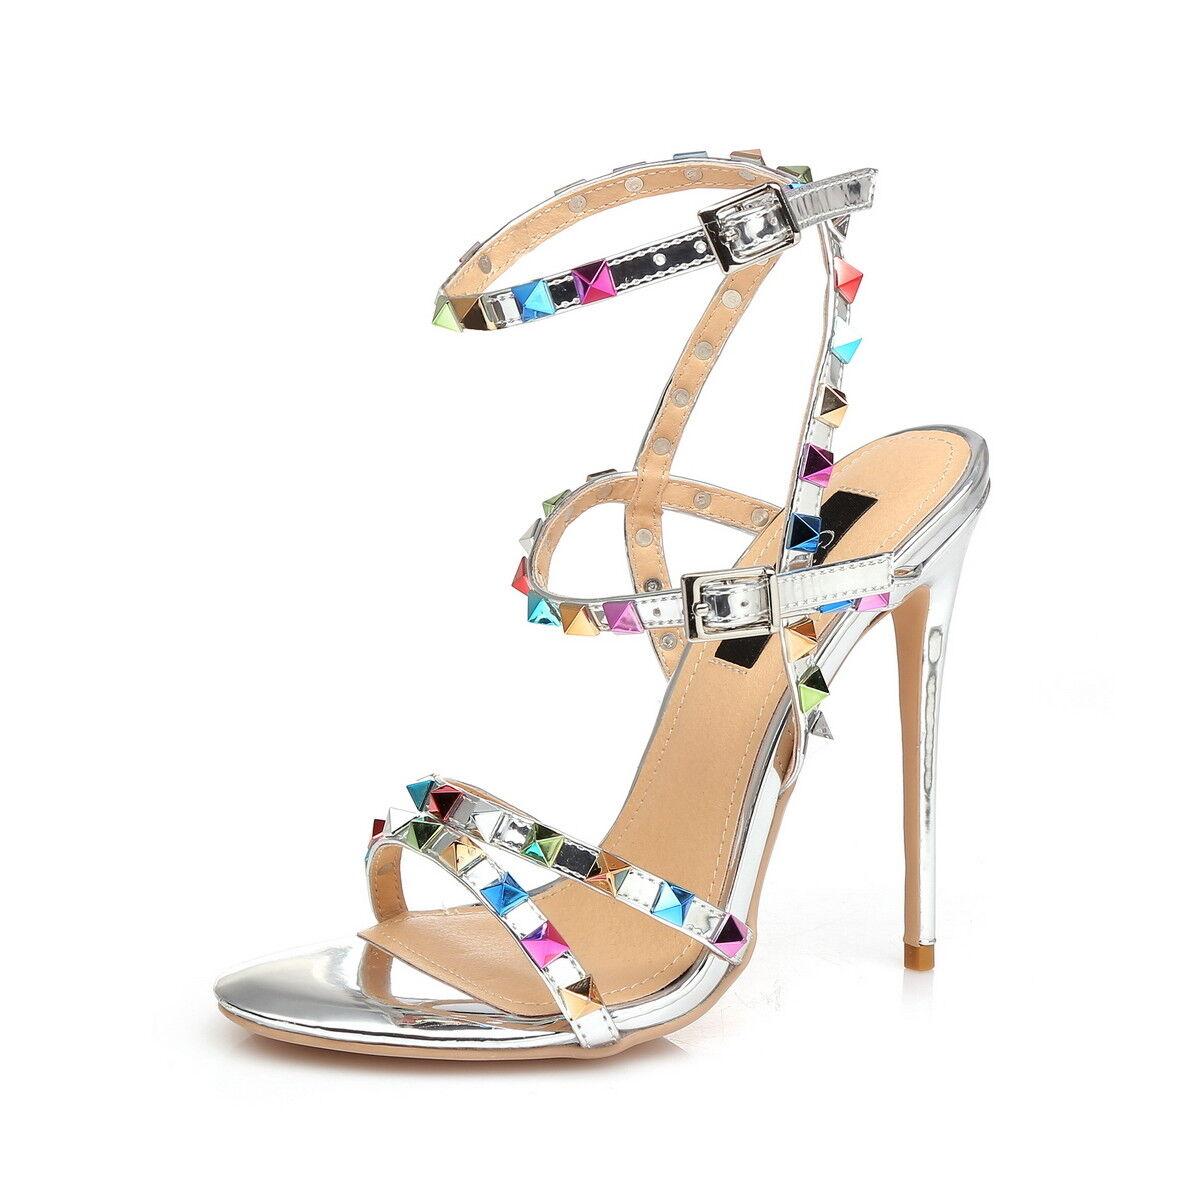 Giaro Sandali in taglie forti grandi scarpe da donna argentoo XXL